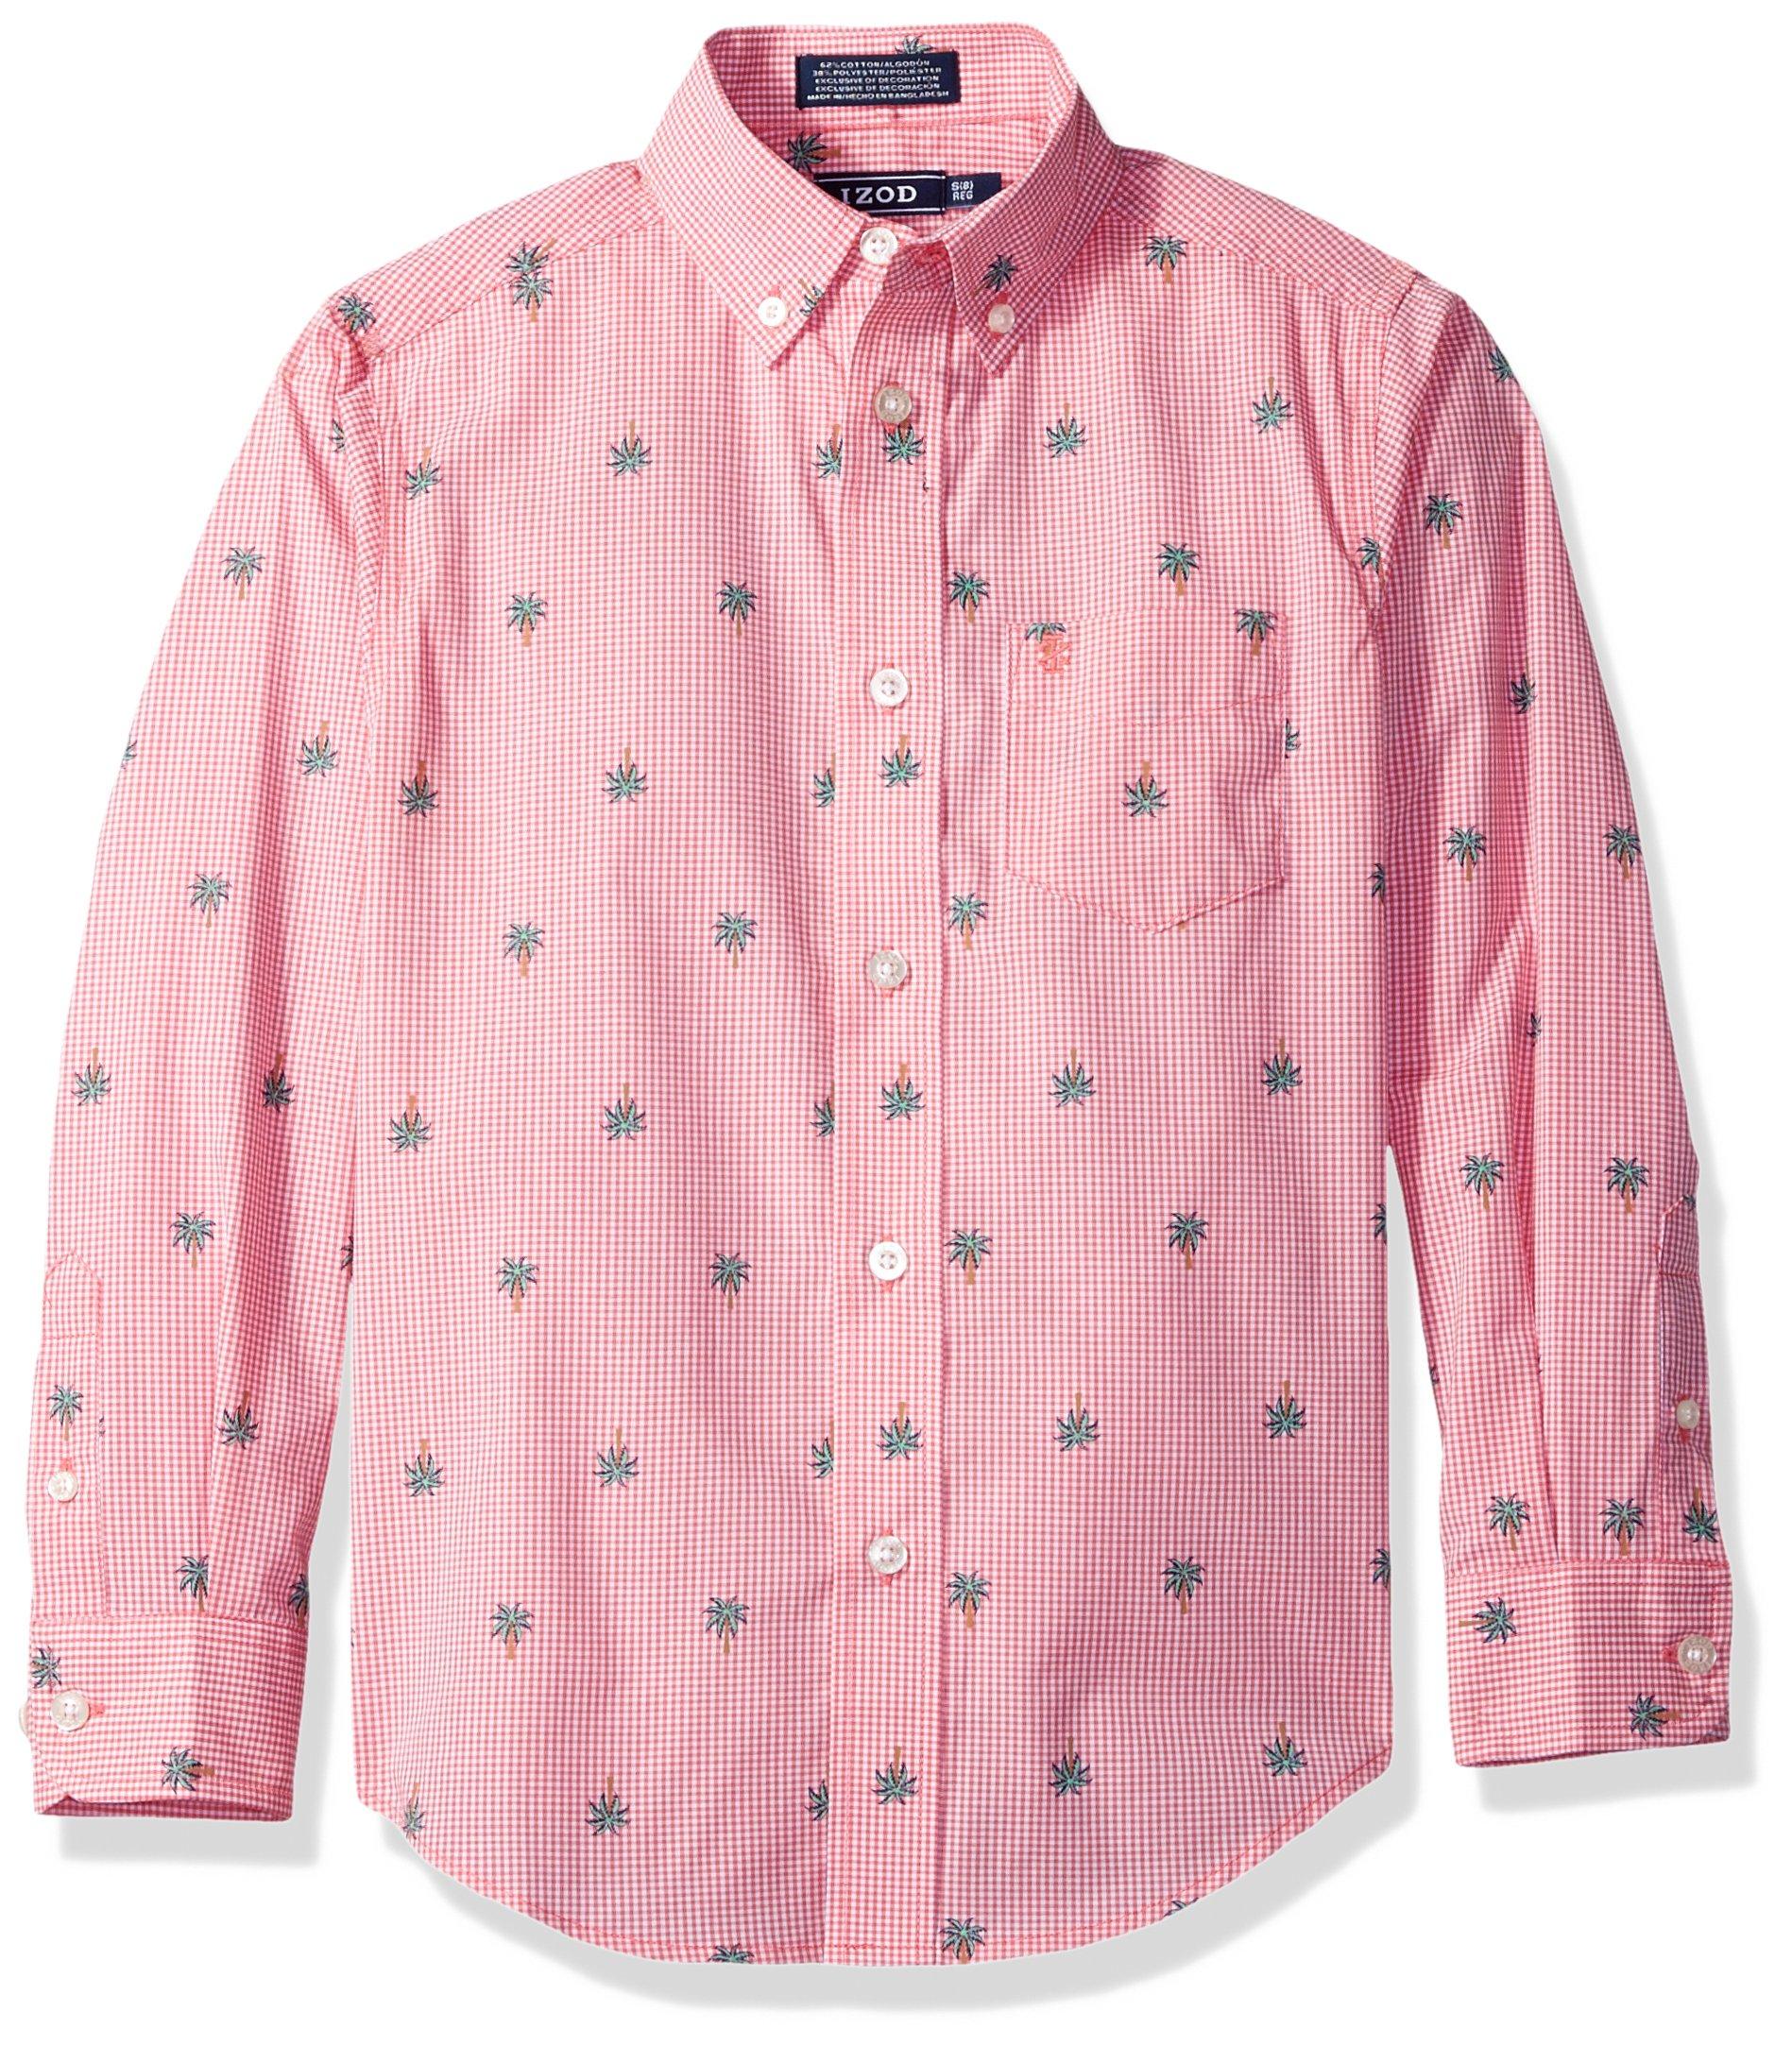 Izod boys Long Sleeve Gingham Button-Down Dress Shirt, Medium Pink, Small